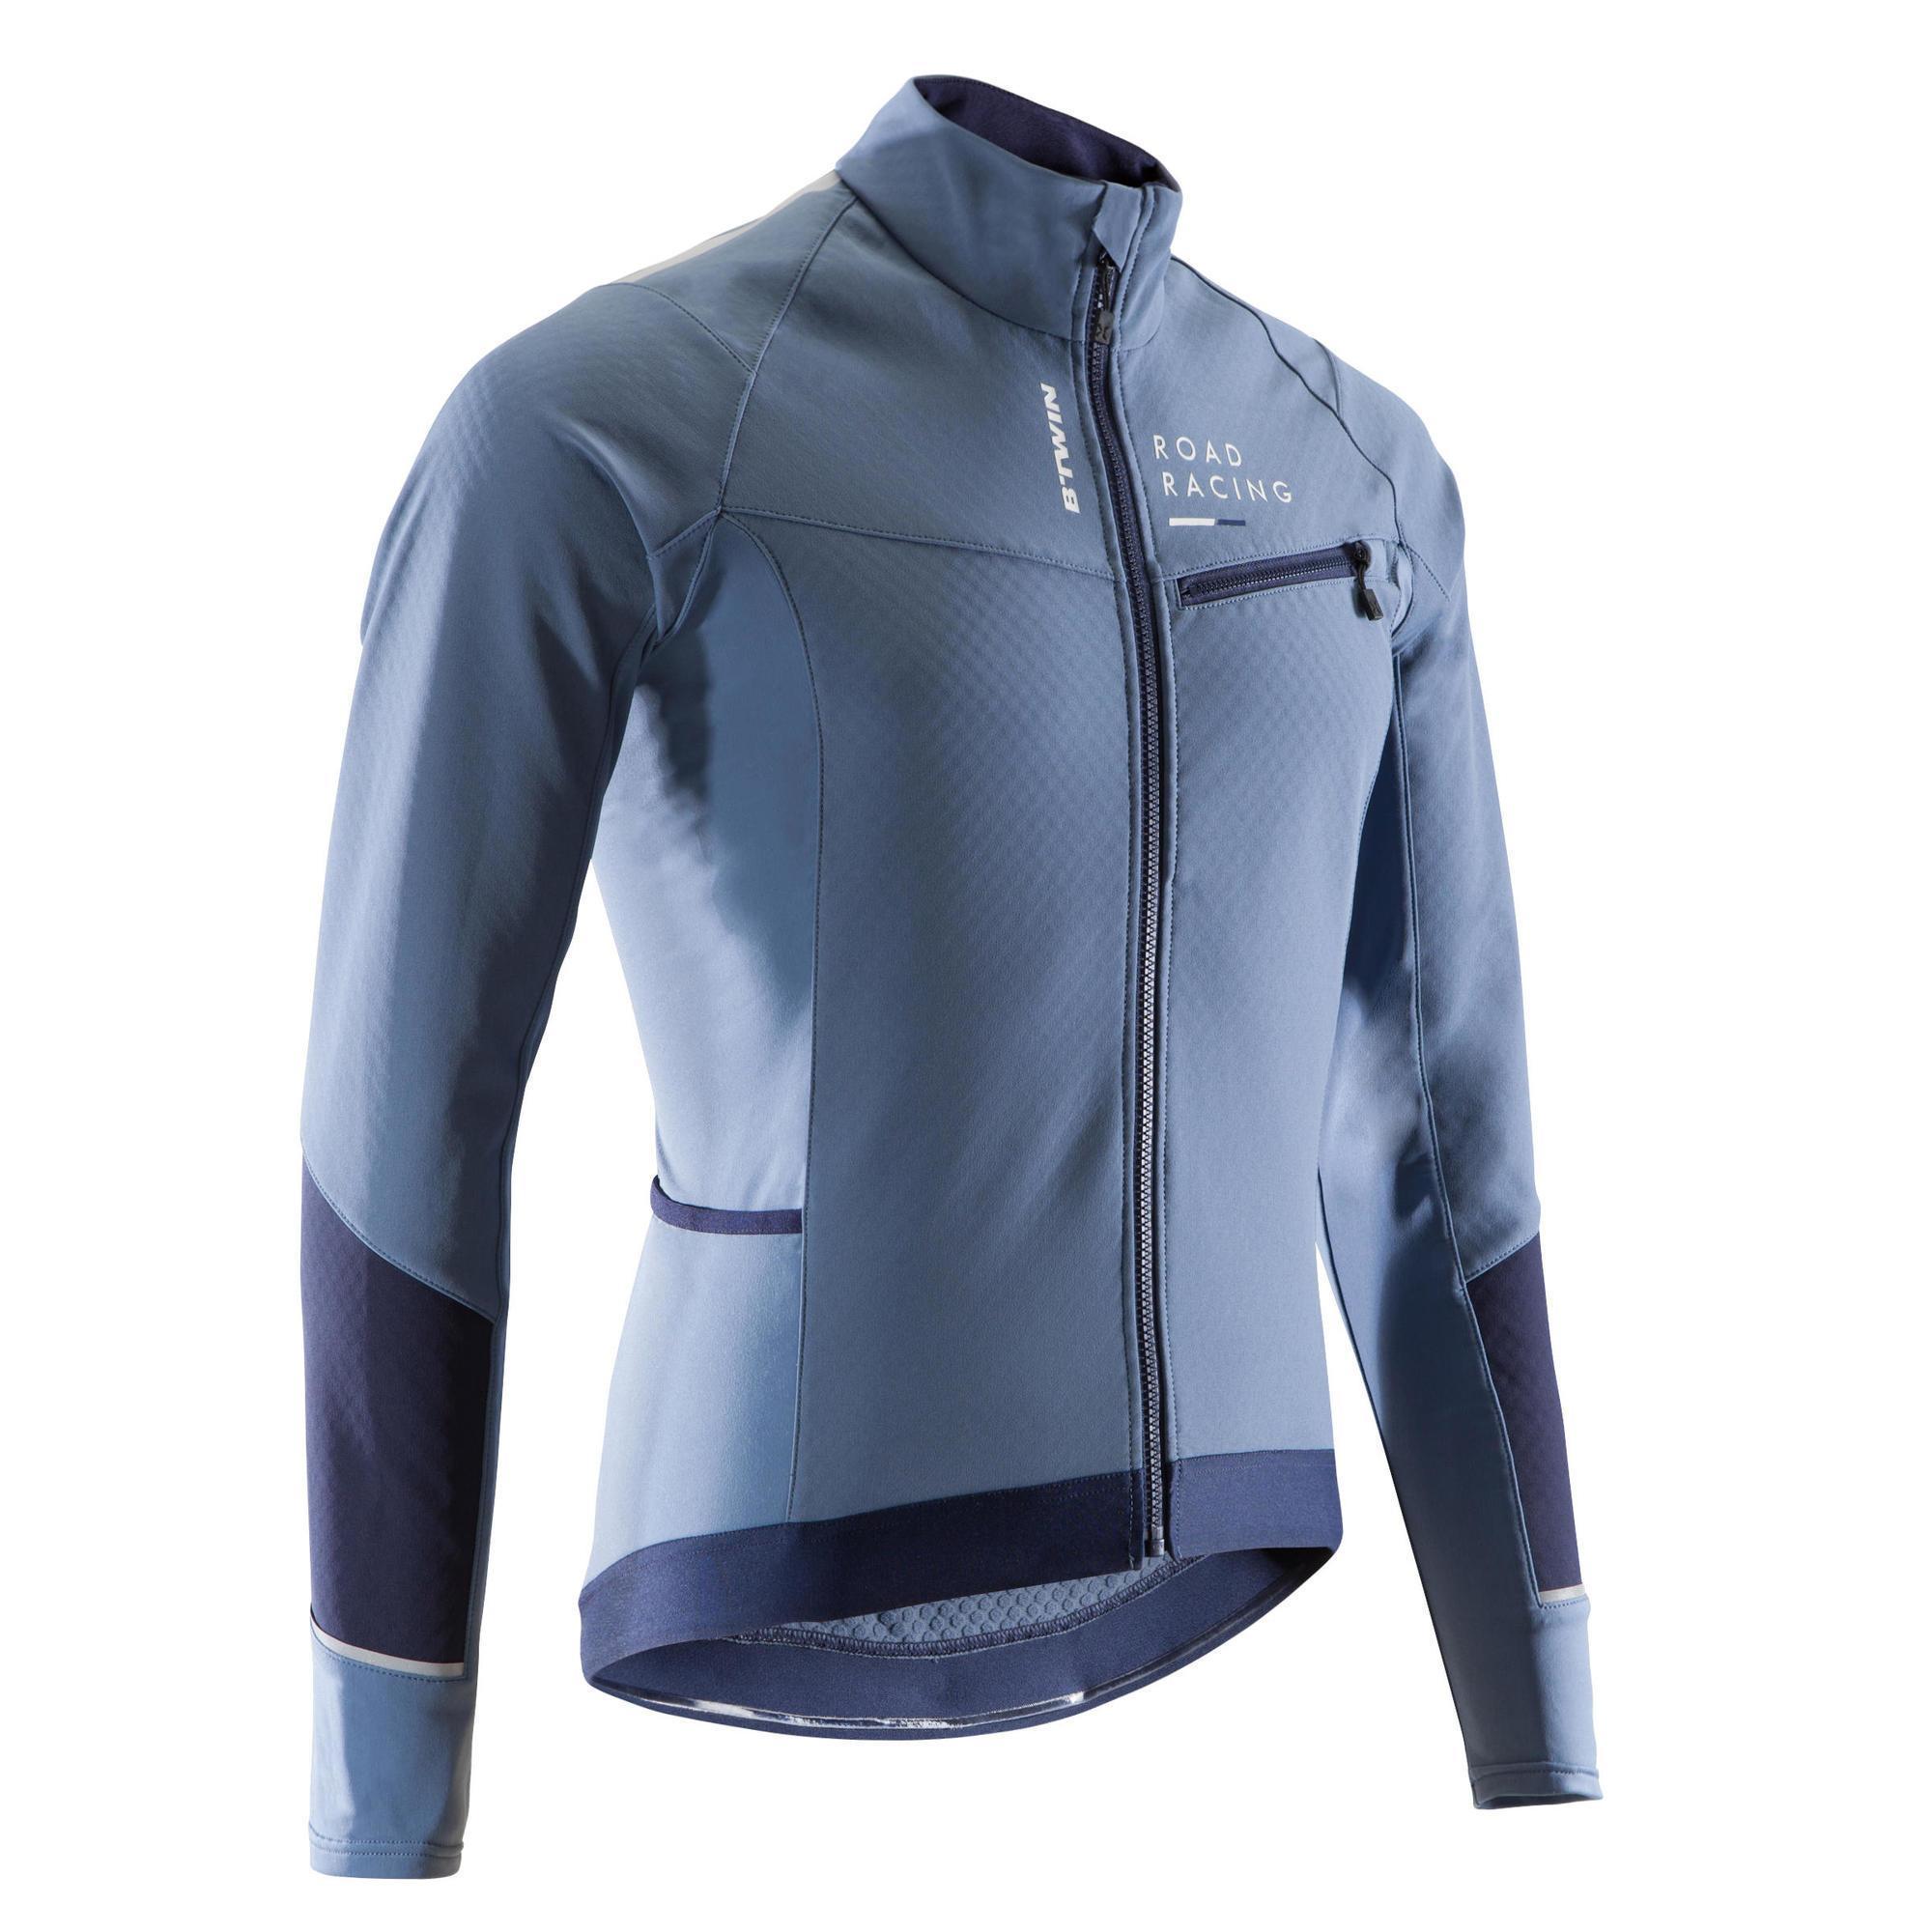 Fahrrad-Winterjacke Rennrad RR 500 Herren grau/blau | Bekleidung > Jacken > Winterjacken | Grau - Blau | B´twin